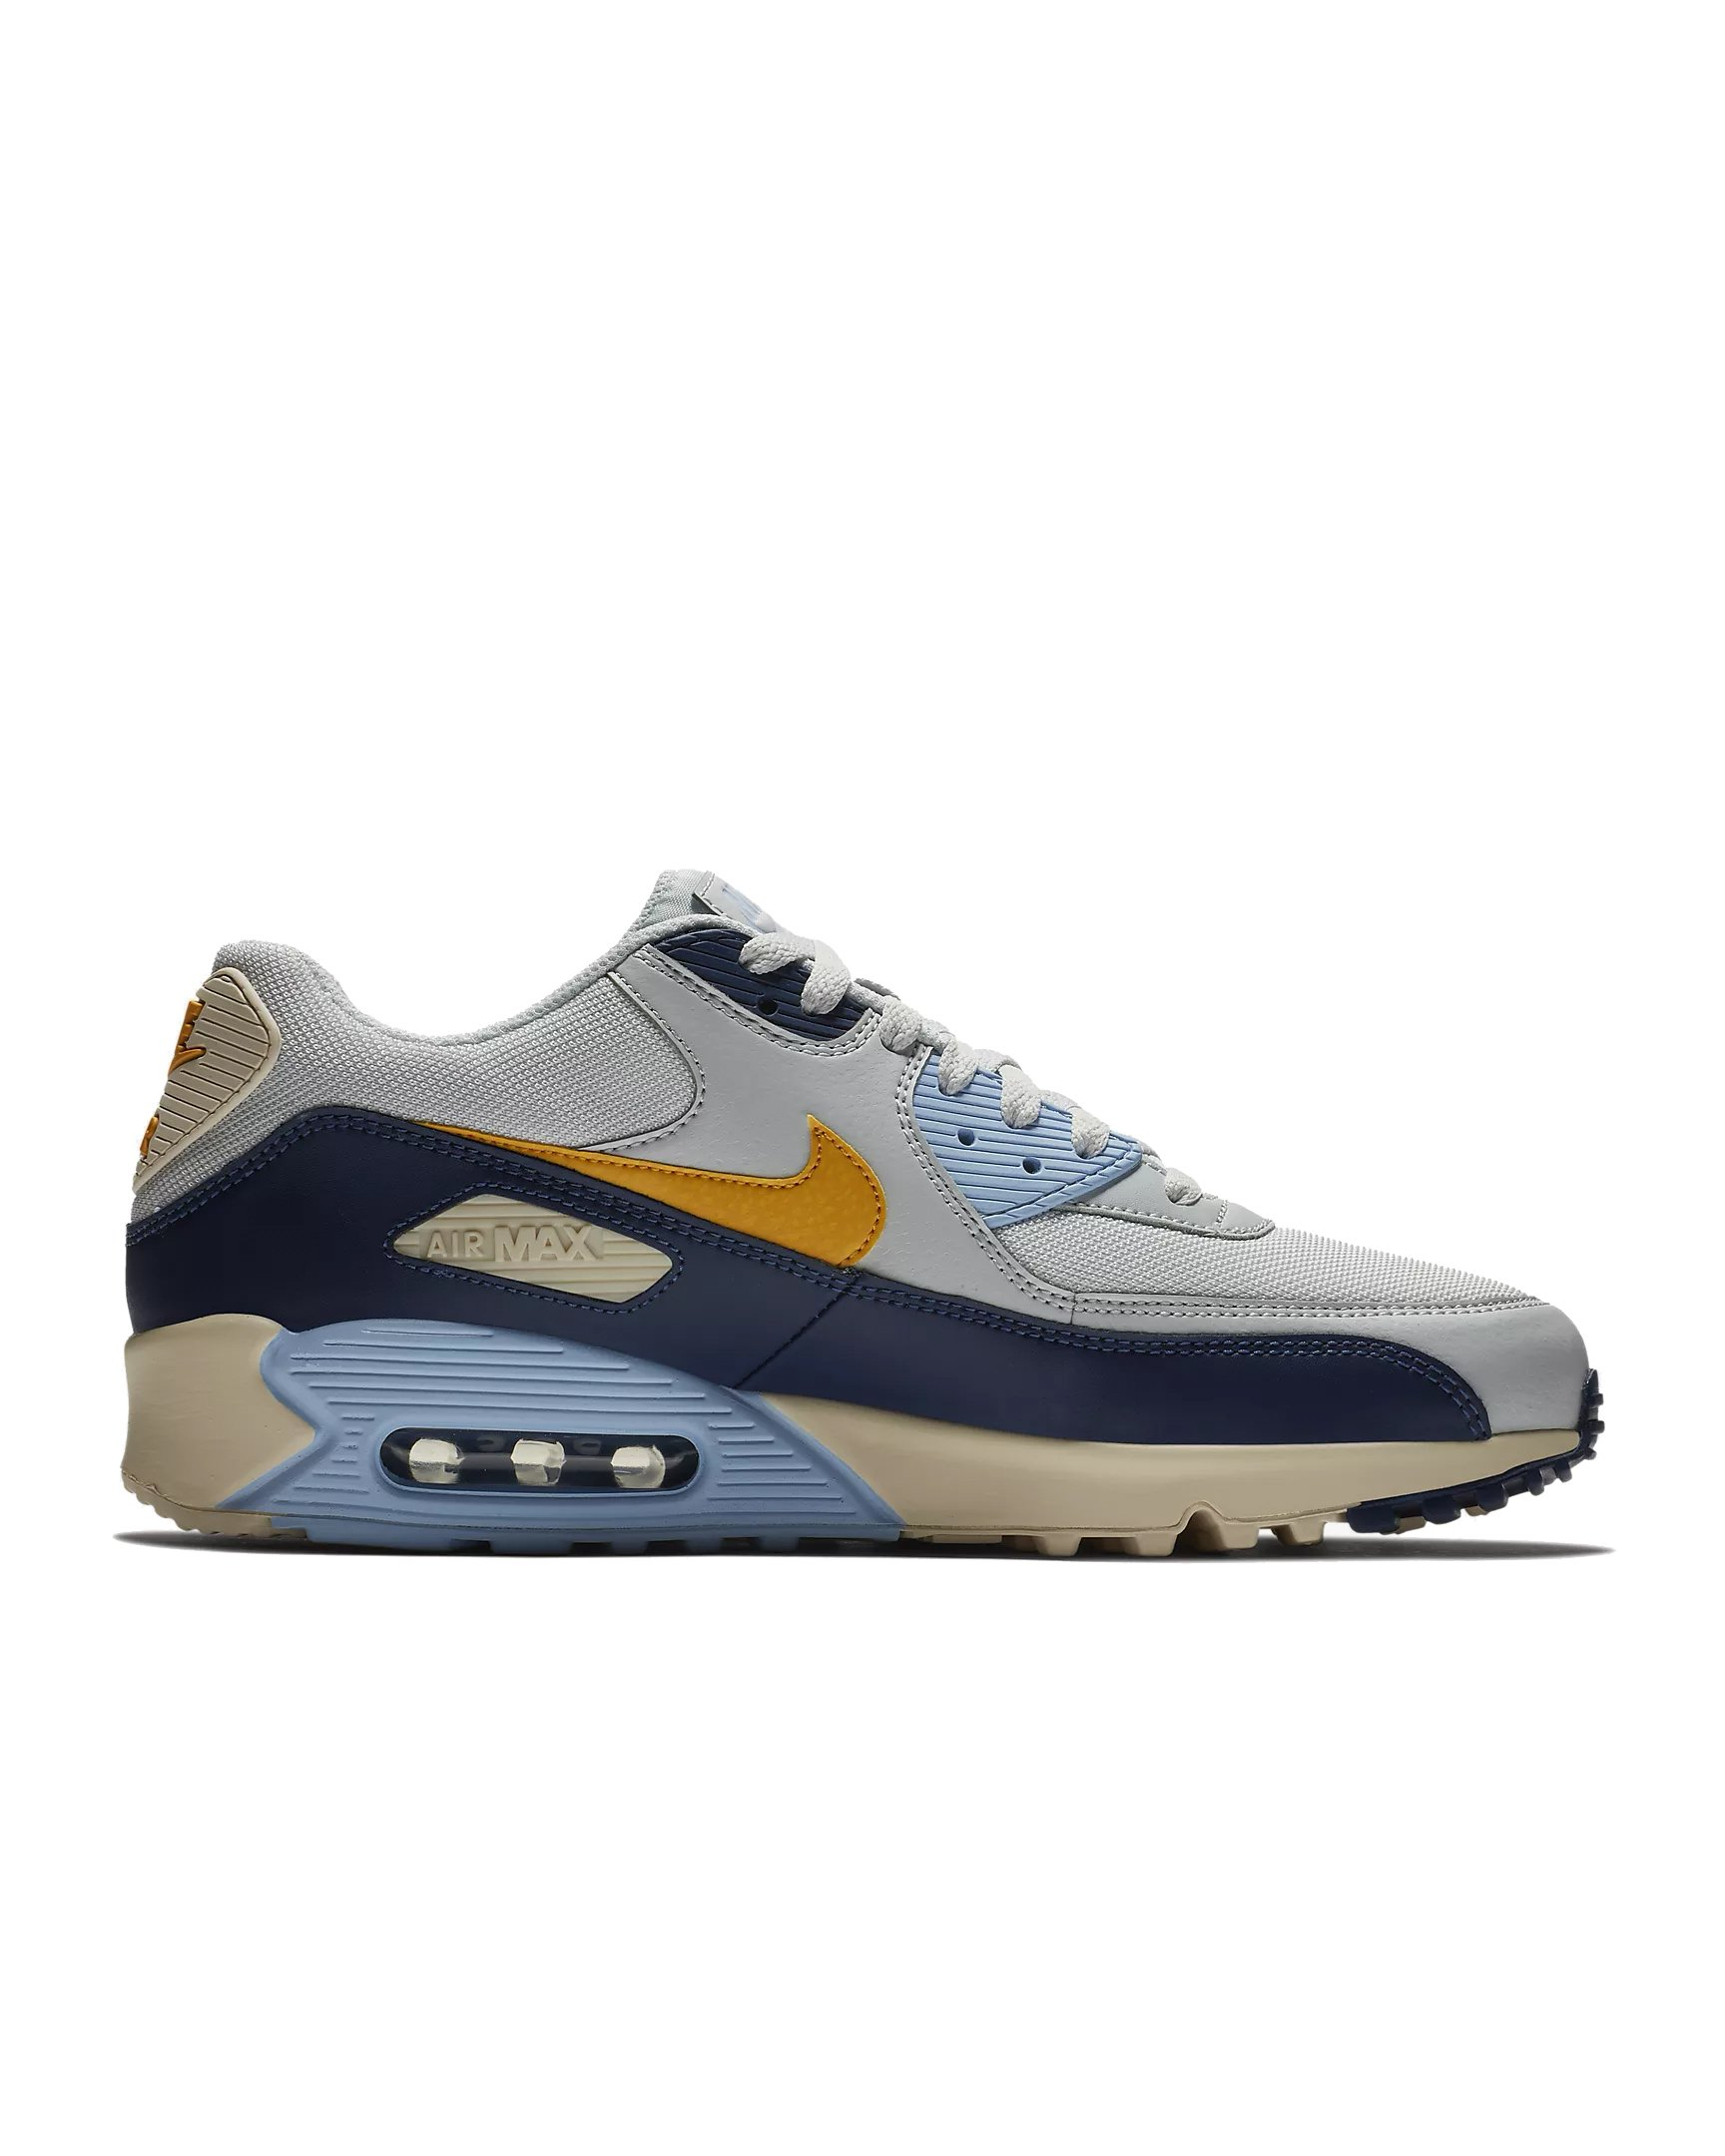 770deddbdfcf3e Galleon - NIKE Mens Air Max 90 Essential Running Shoes Pure Platinum Yellow  Ochre Blue Void AJ1285-008 Size 8